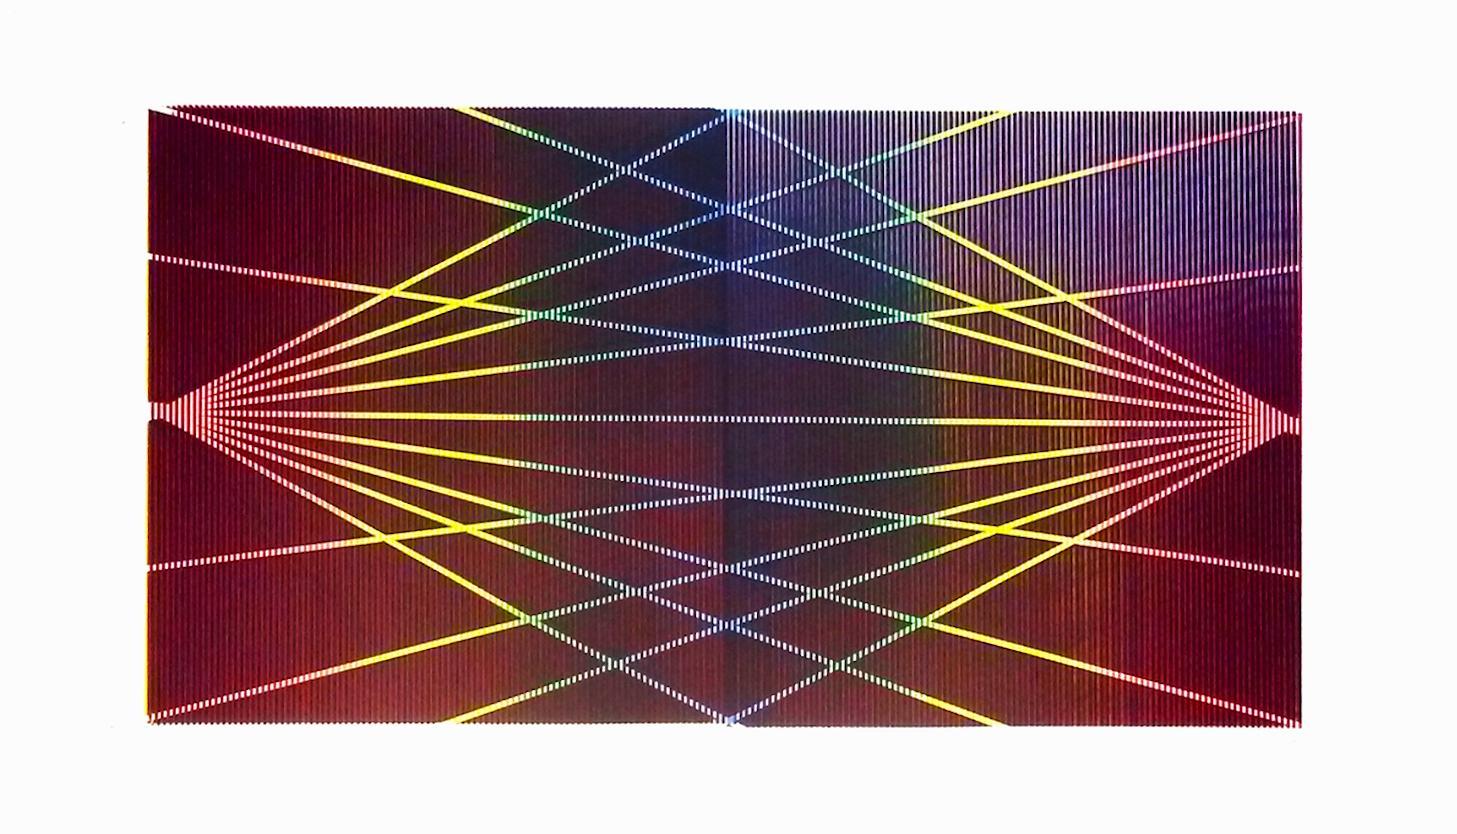 Matti Havens, Stellar Spectrum 1, 2019, Screenprint, 22x39, frame size 30x48 in